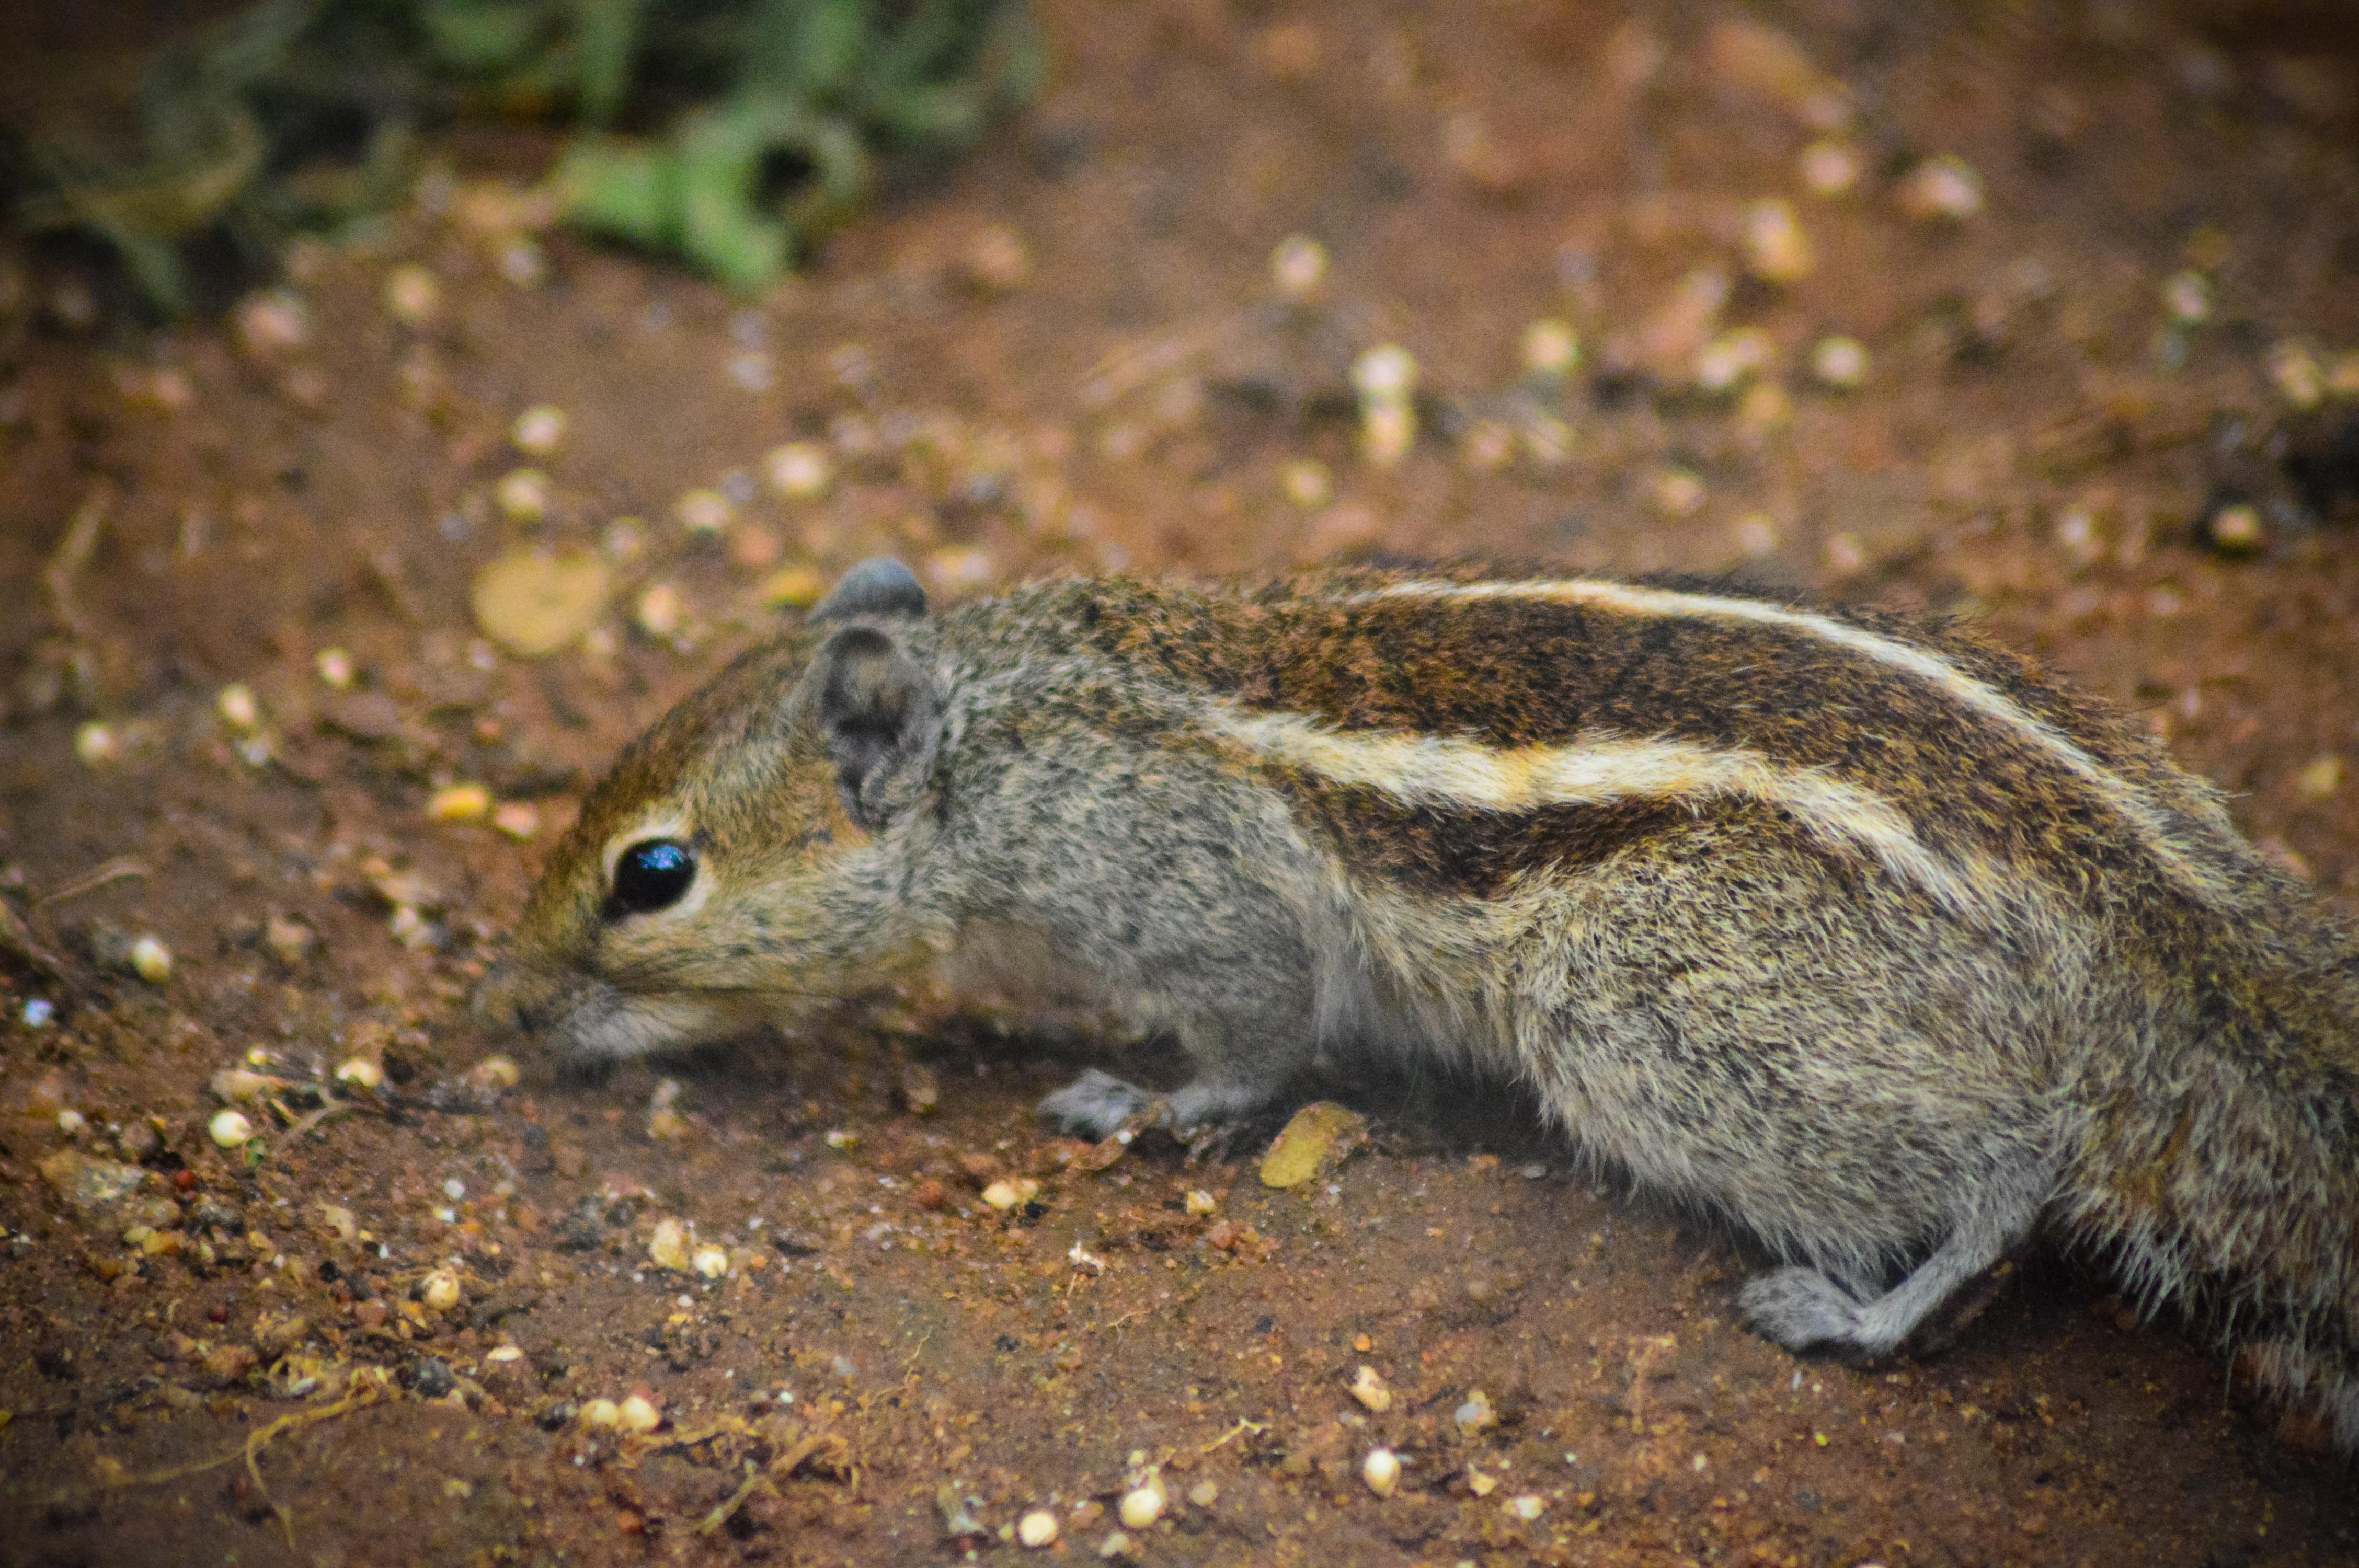 Squirrel, Animal, Beautiful, Colors, Eting, HQ Photo